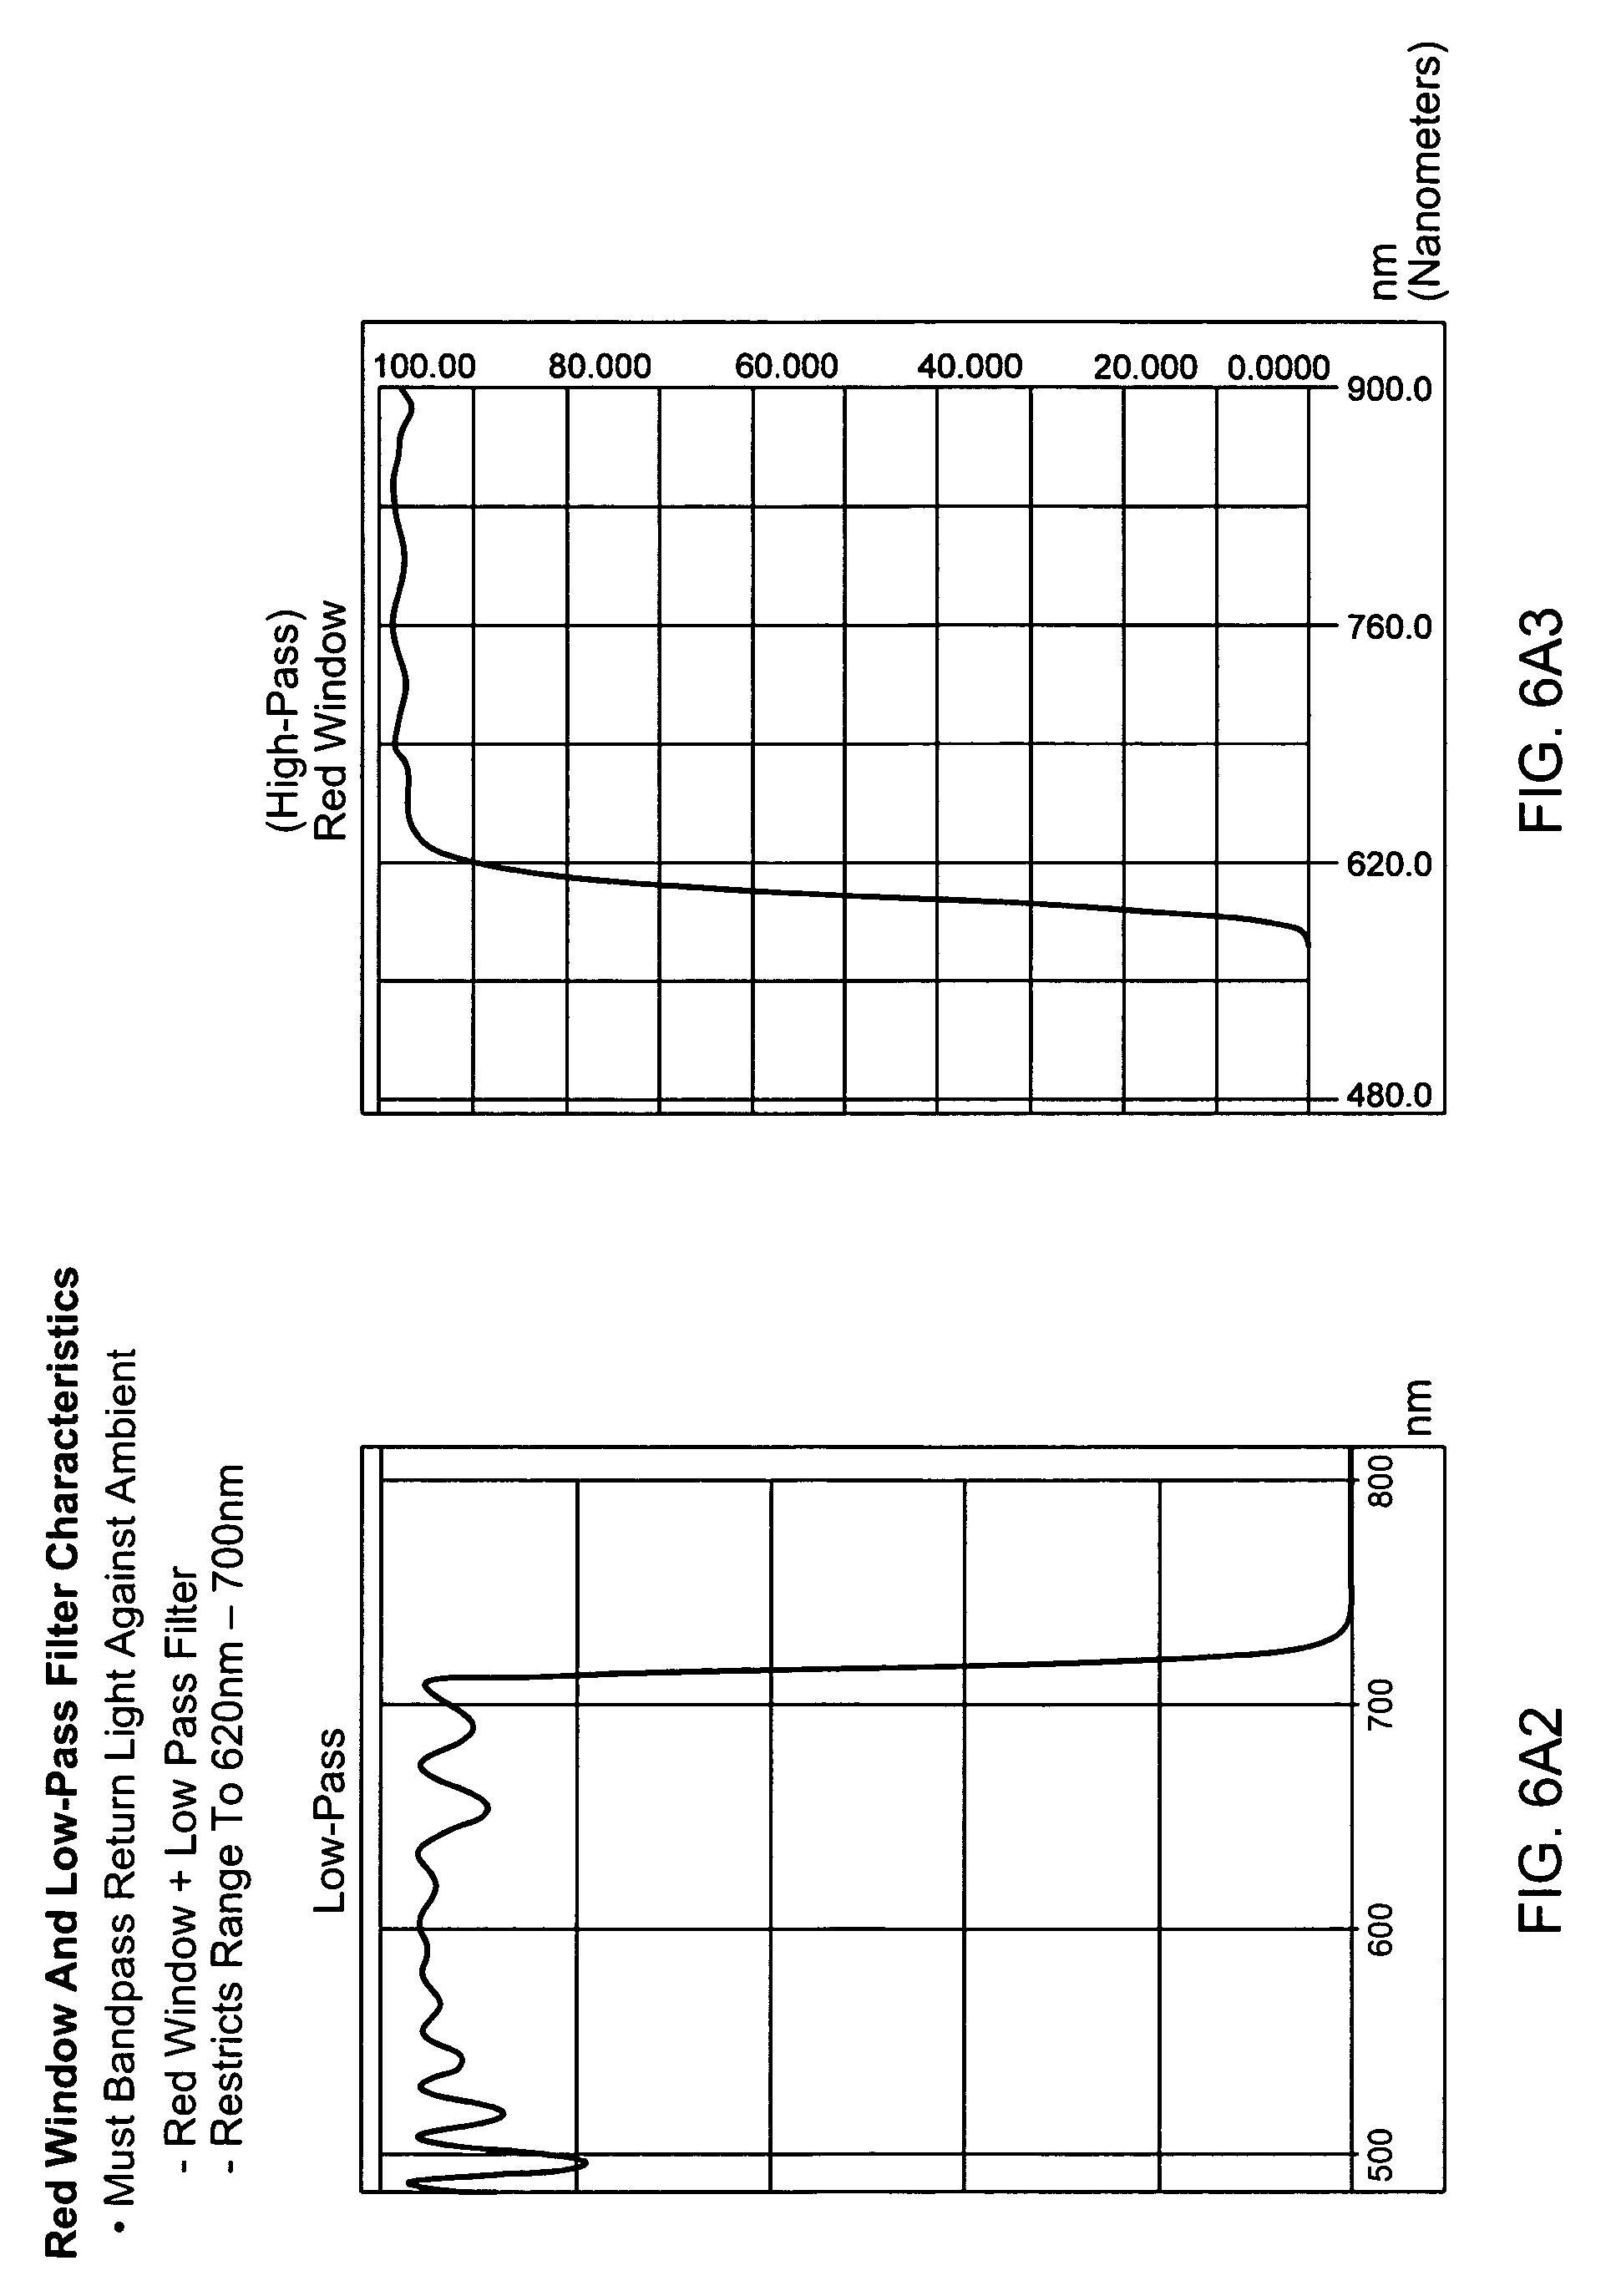 Patent US 7,293,714 B2